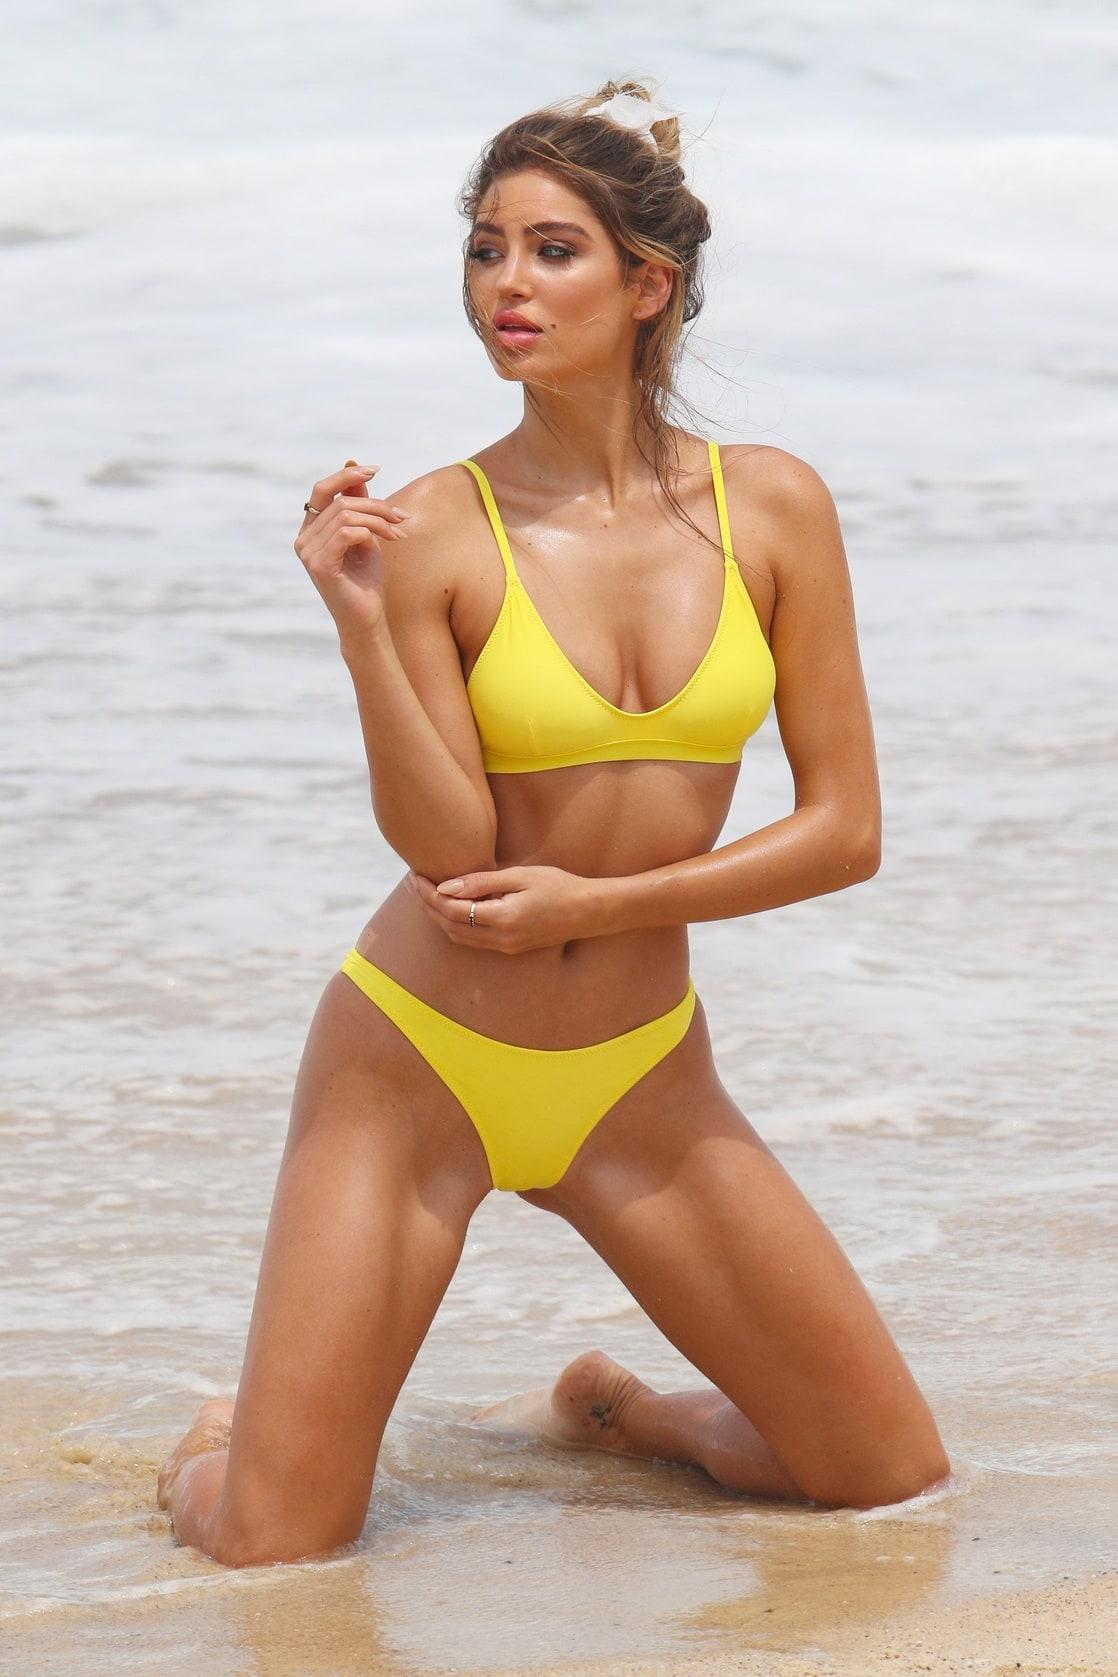 Bikini Katya Sambuca nude photos 2019